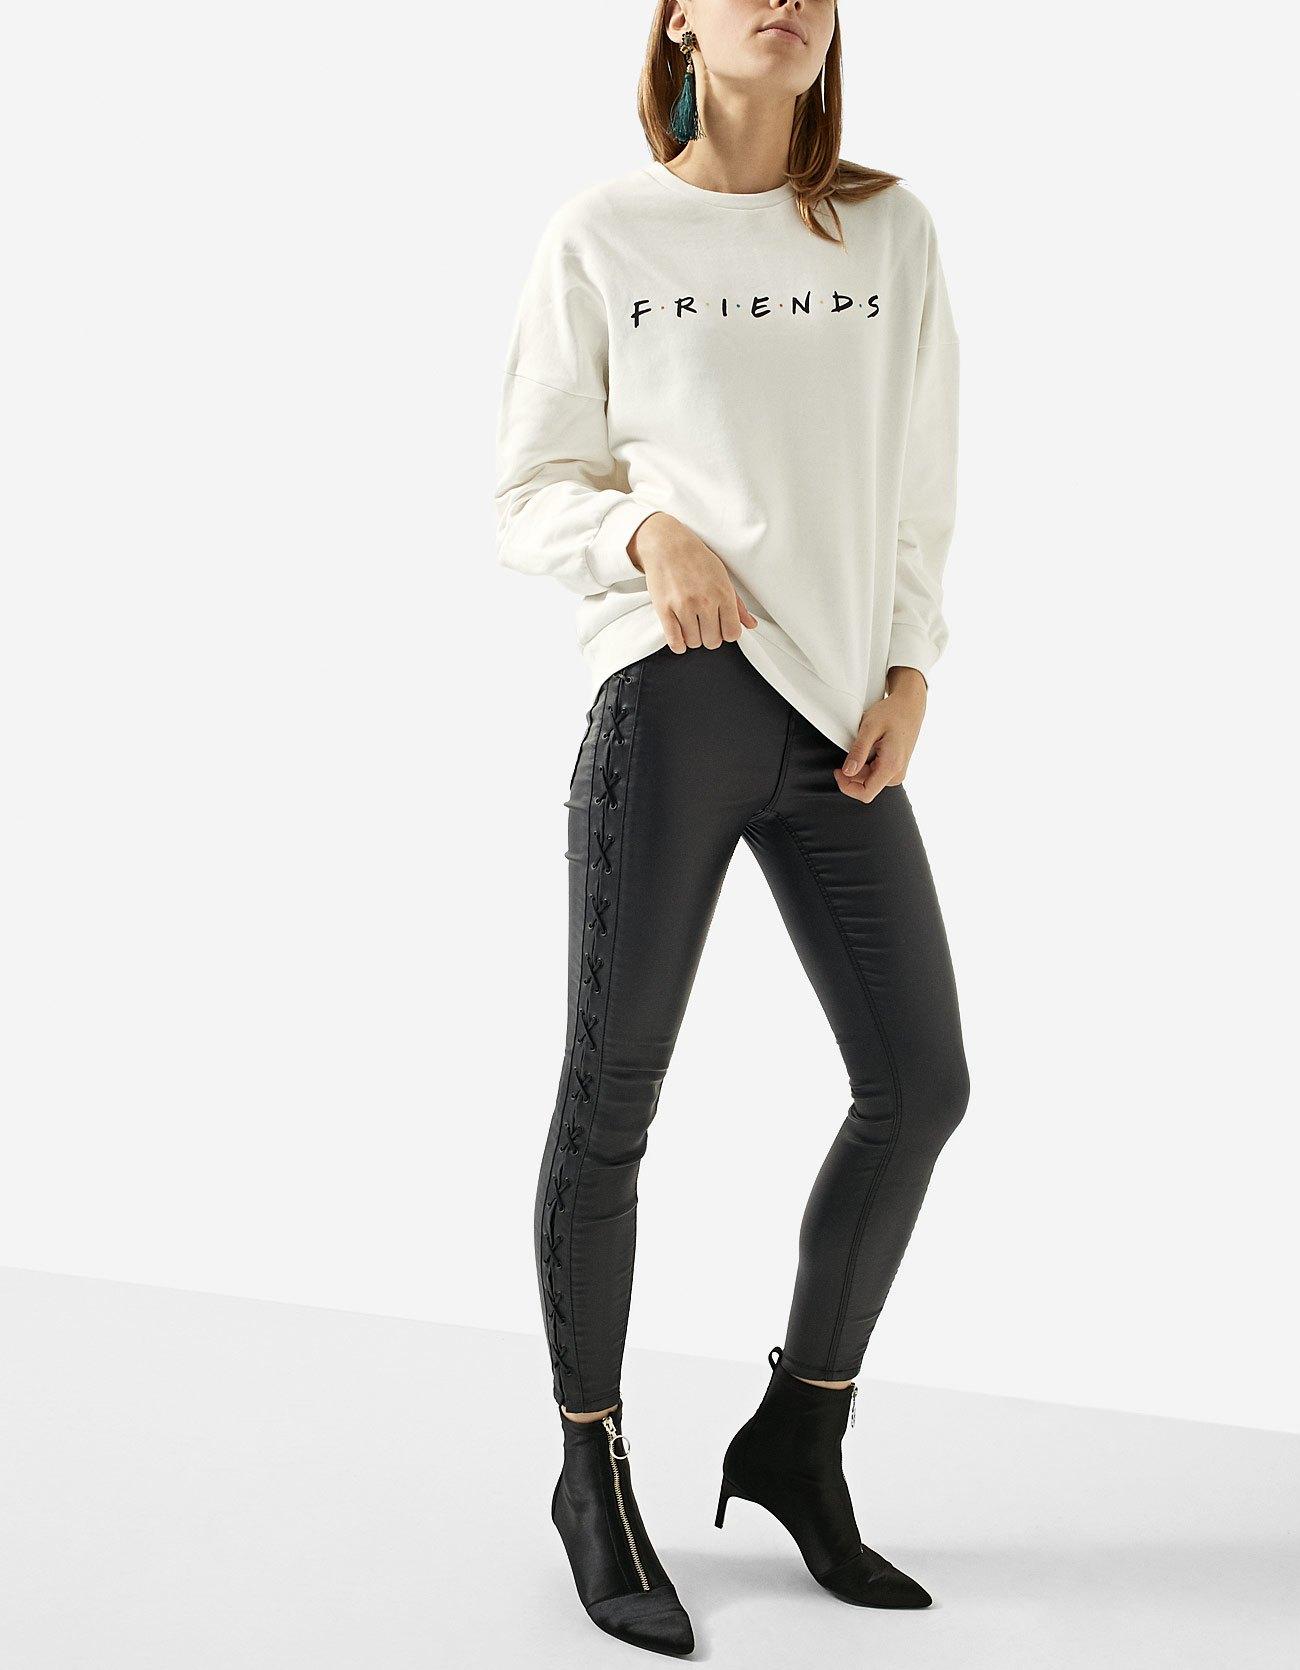 fashion_site_hu.jpg